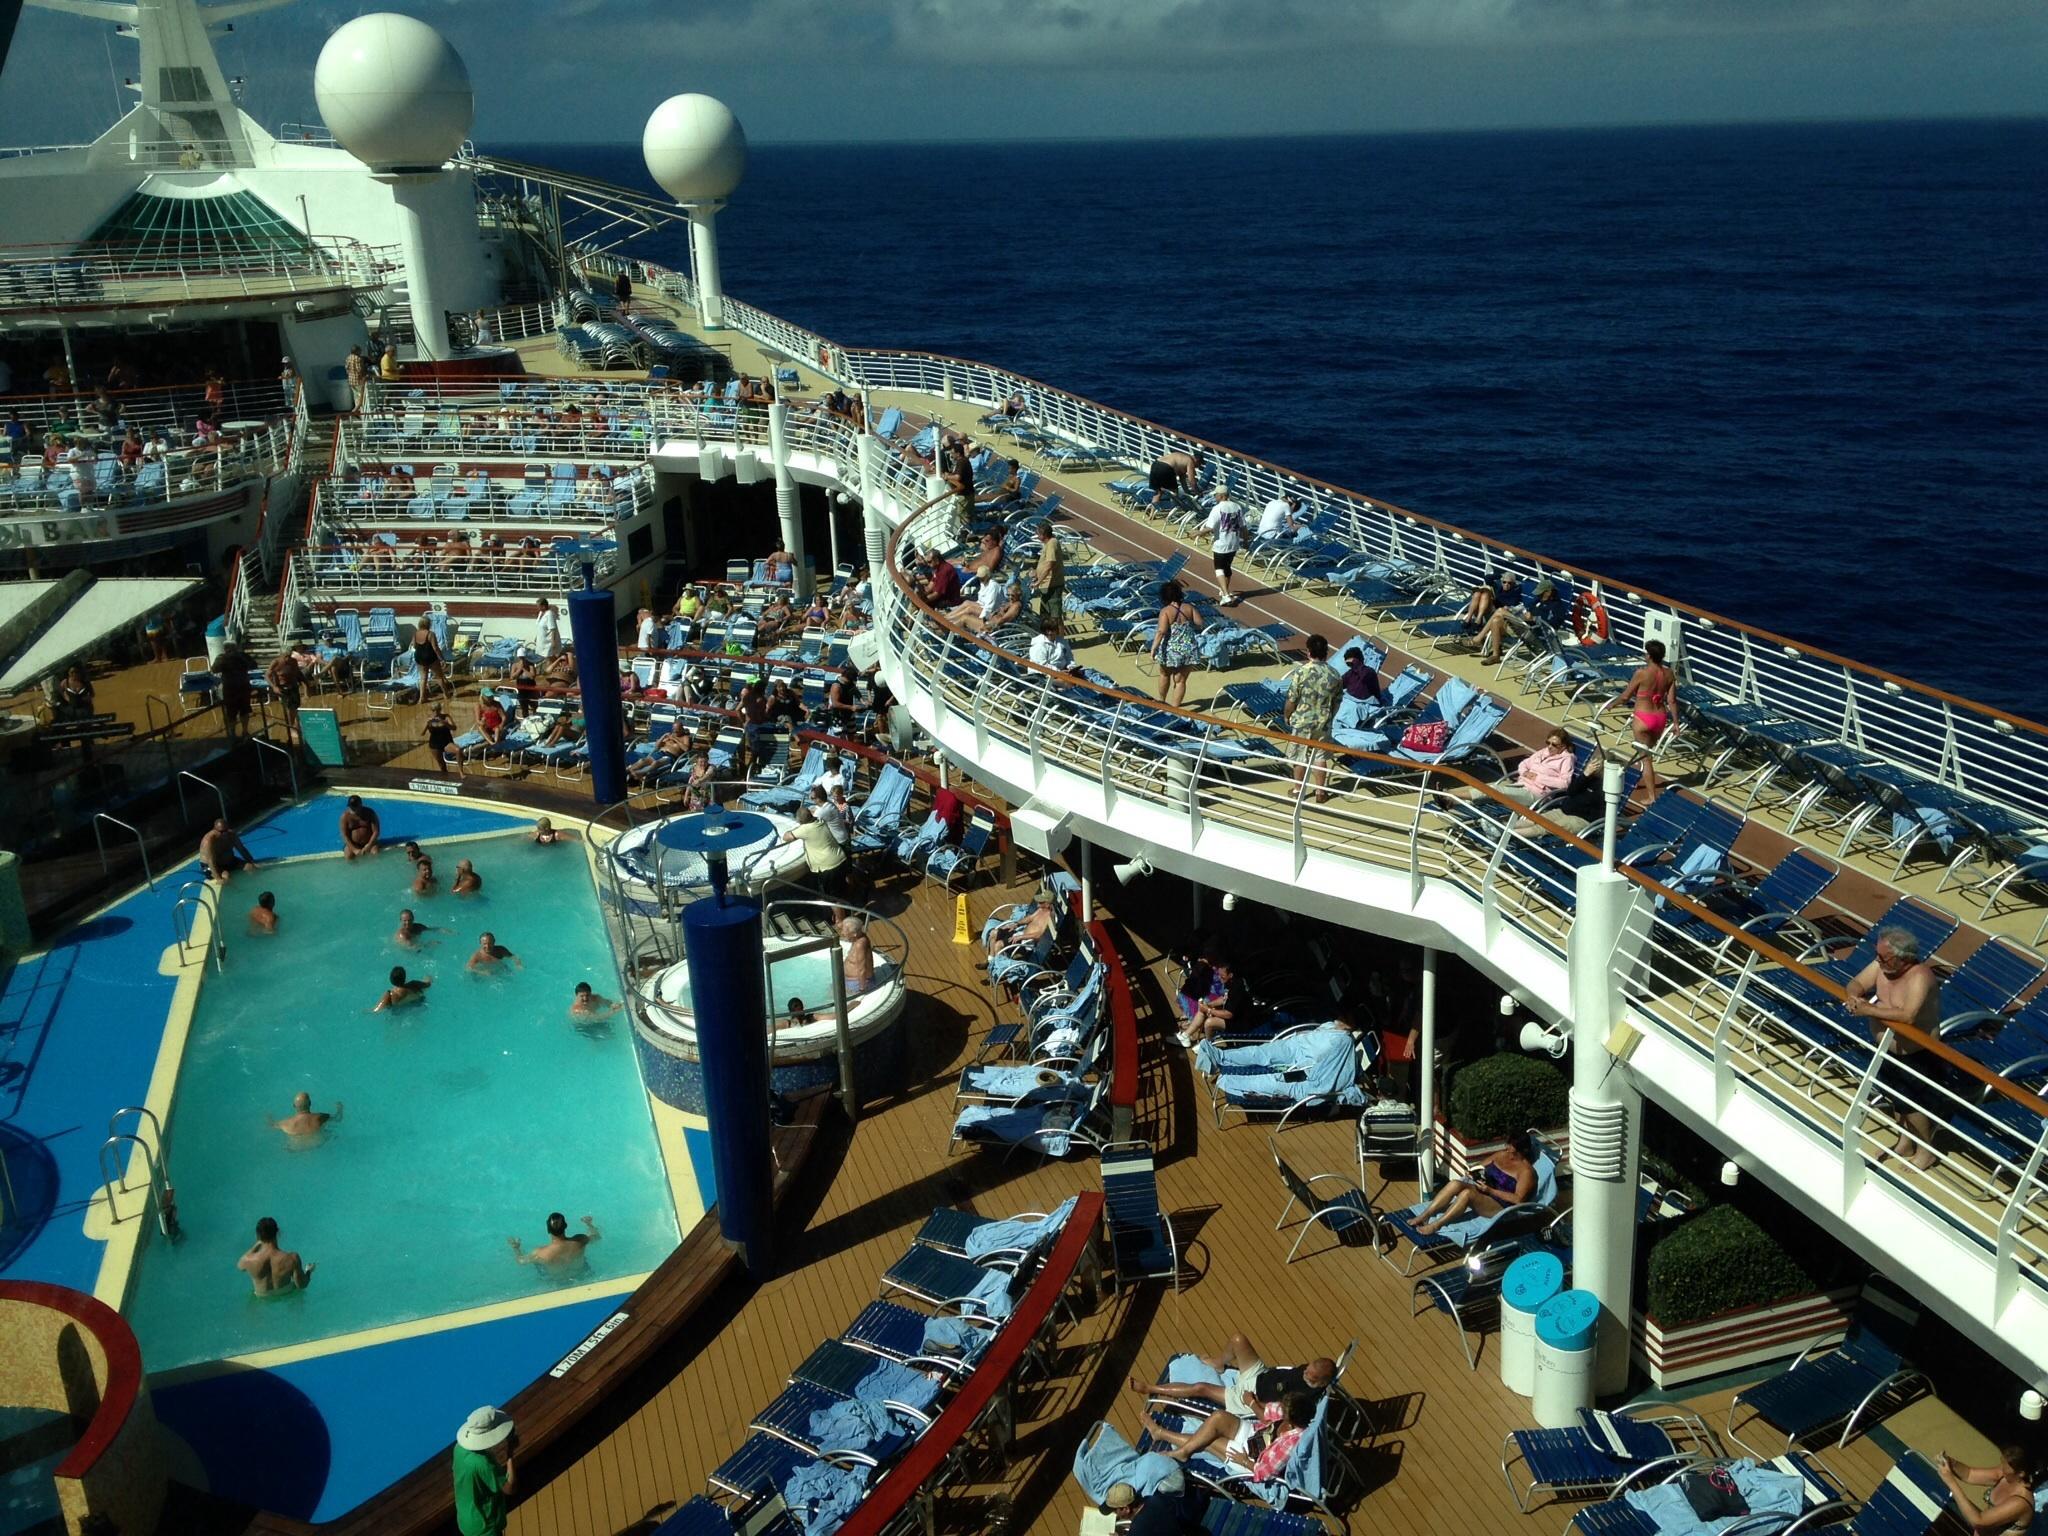 Explorer Of The Seas Cruise Review Mar 11 2014